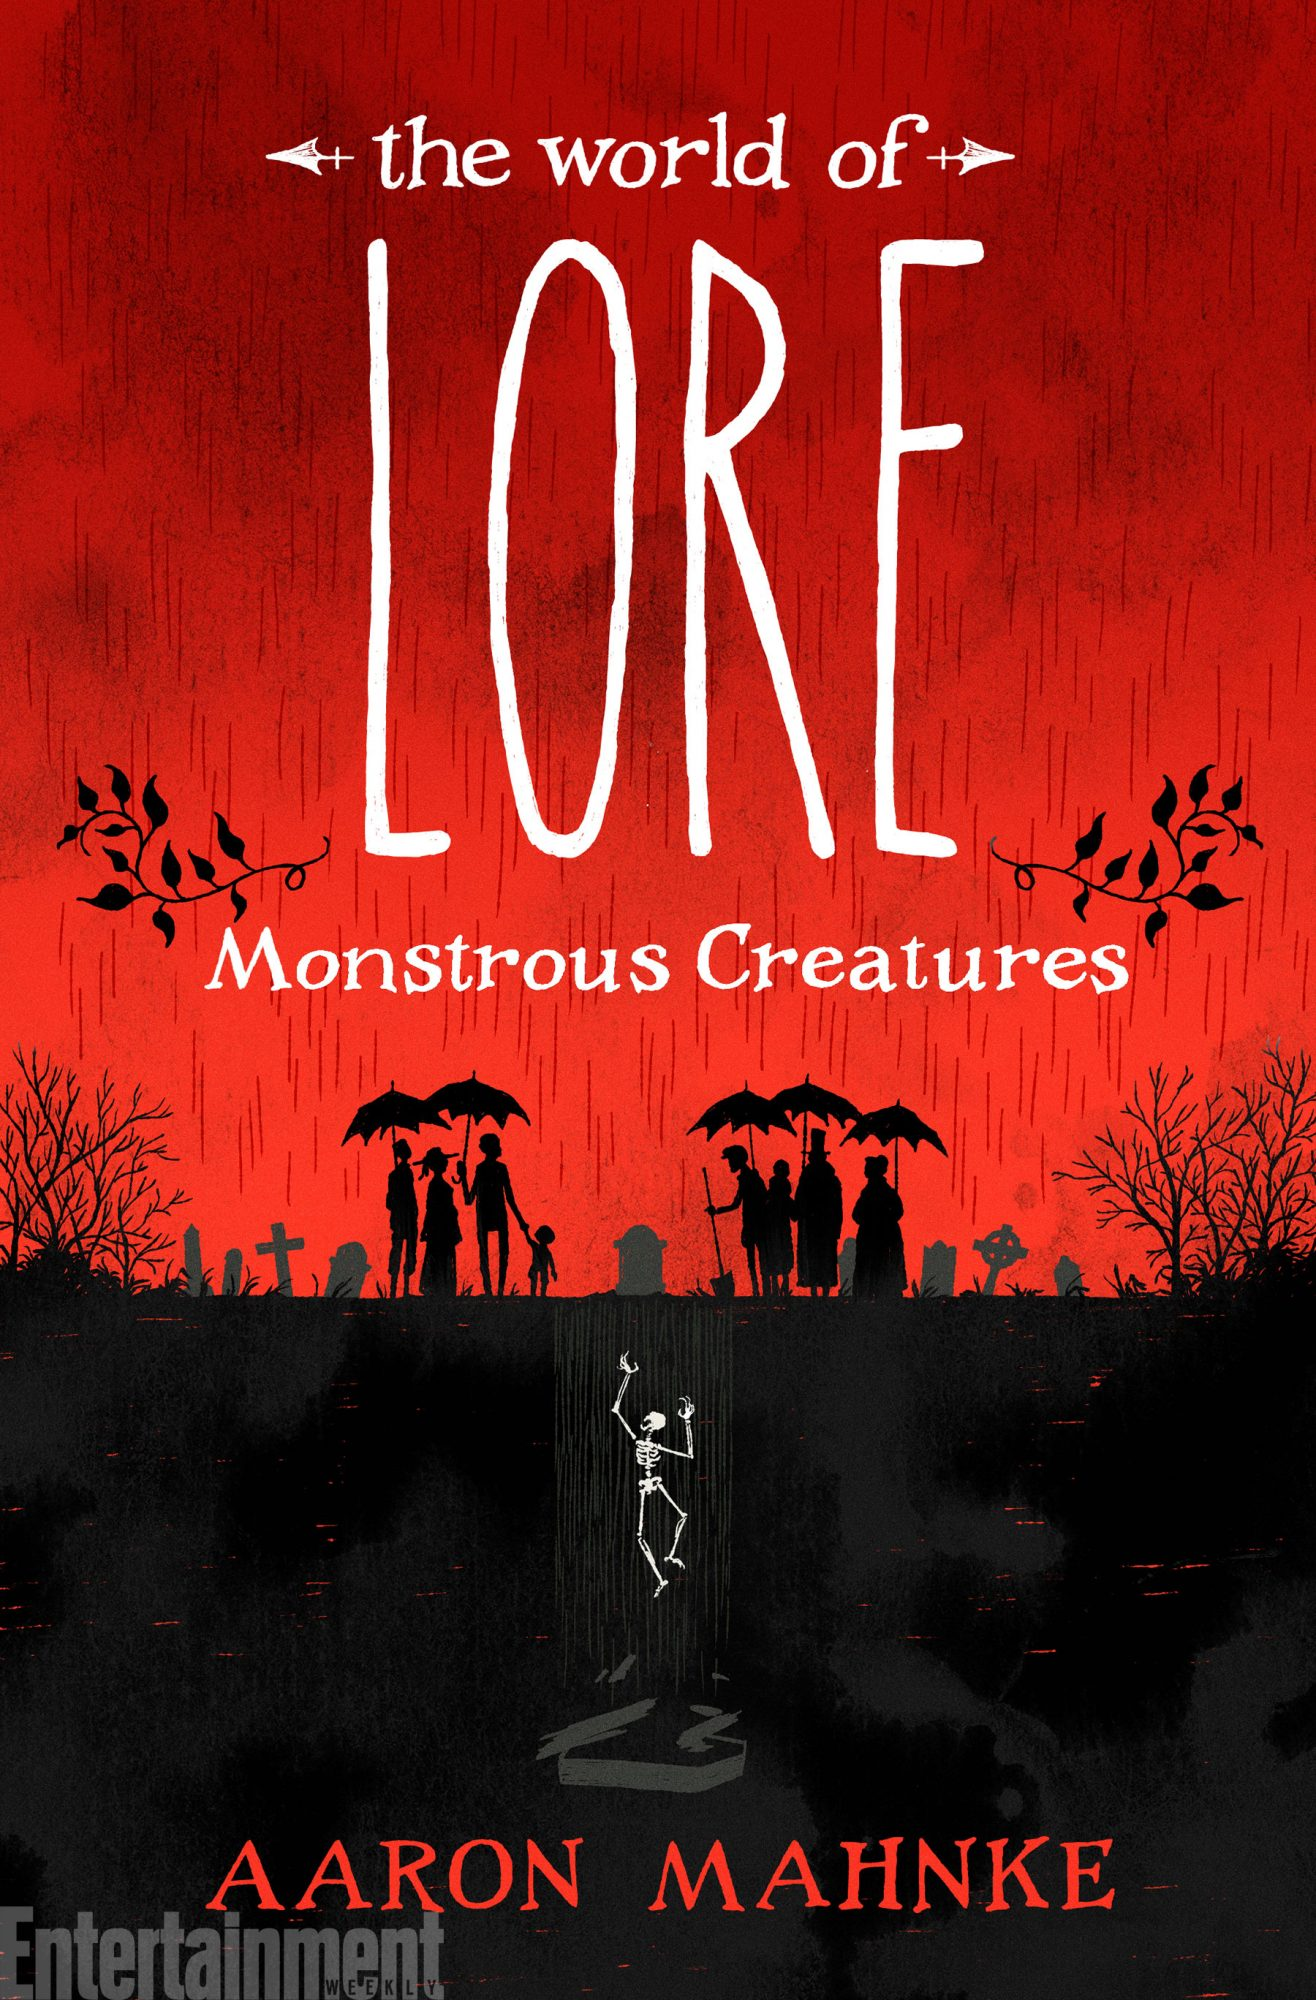 LORE-MONSTROUS-CREATURES---cover[2]